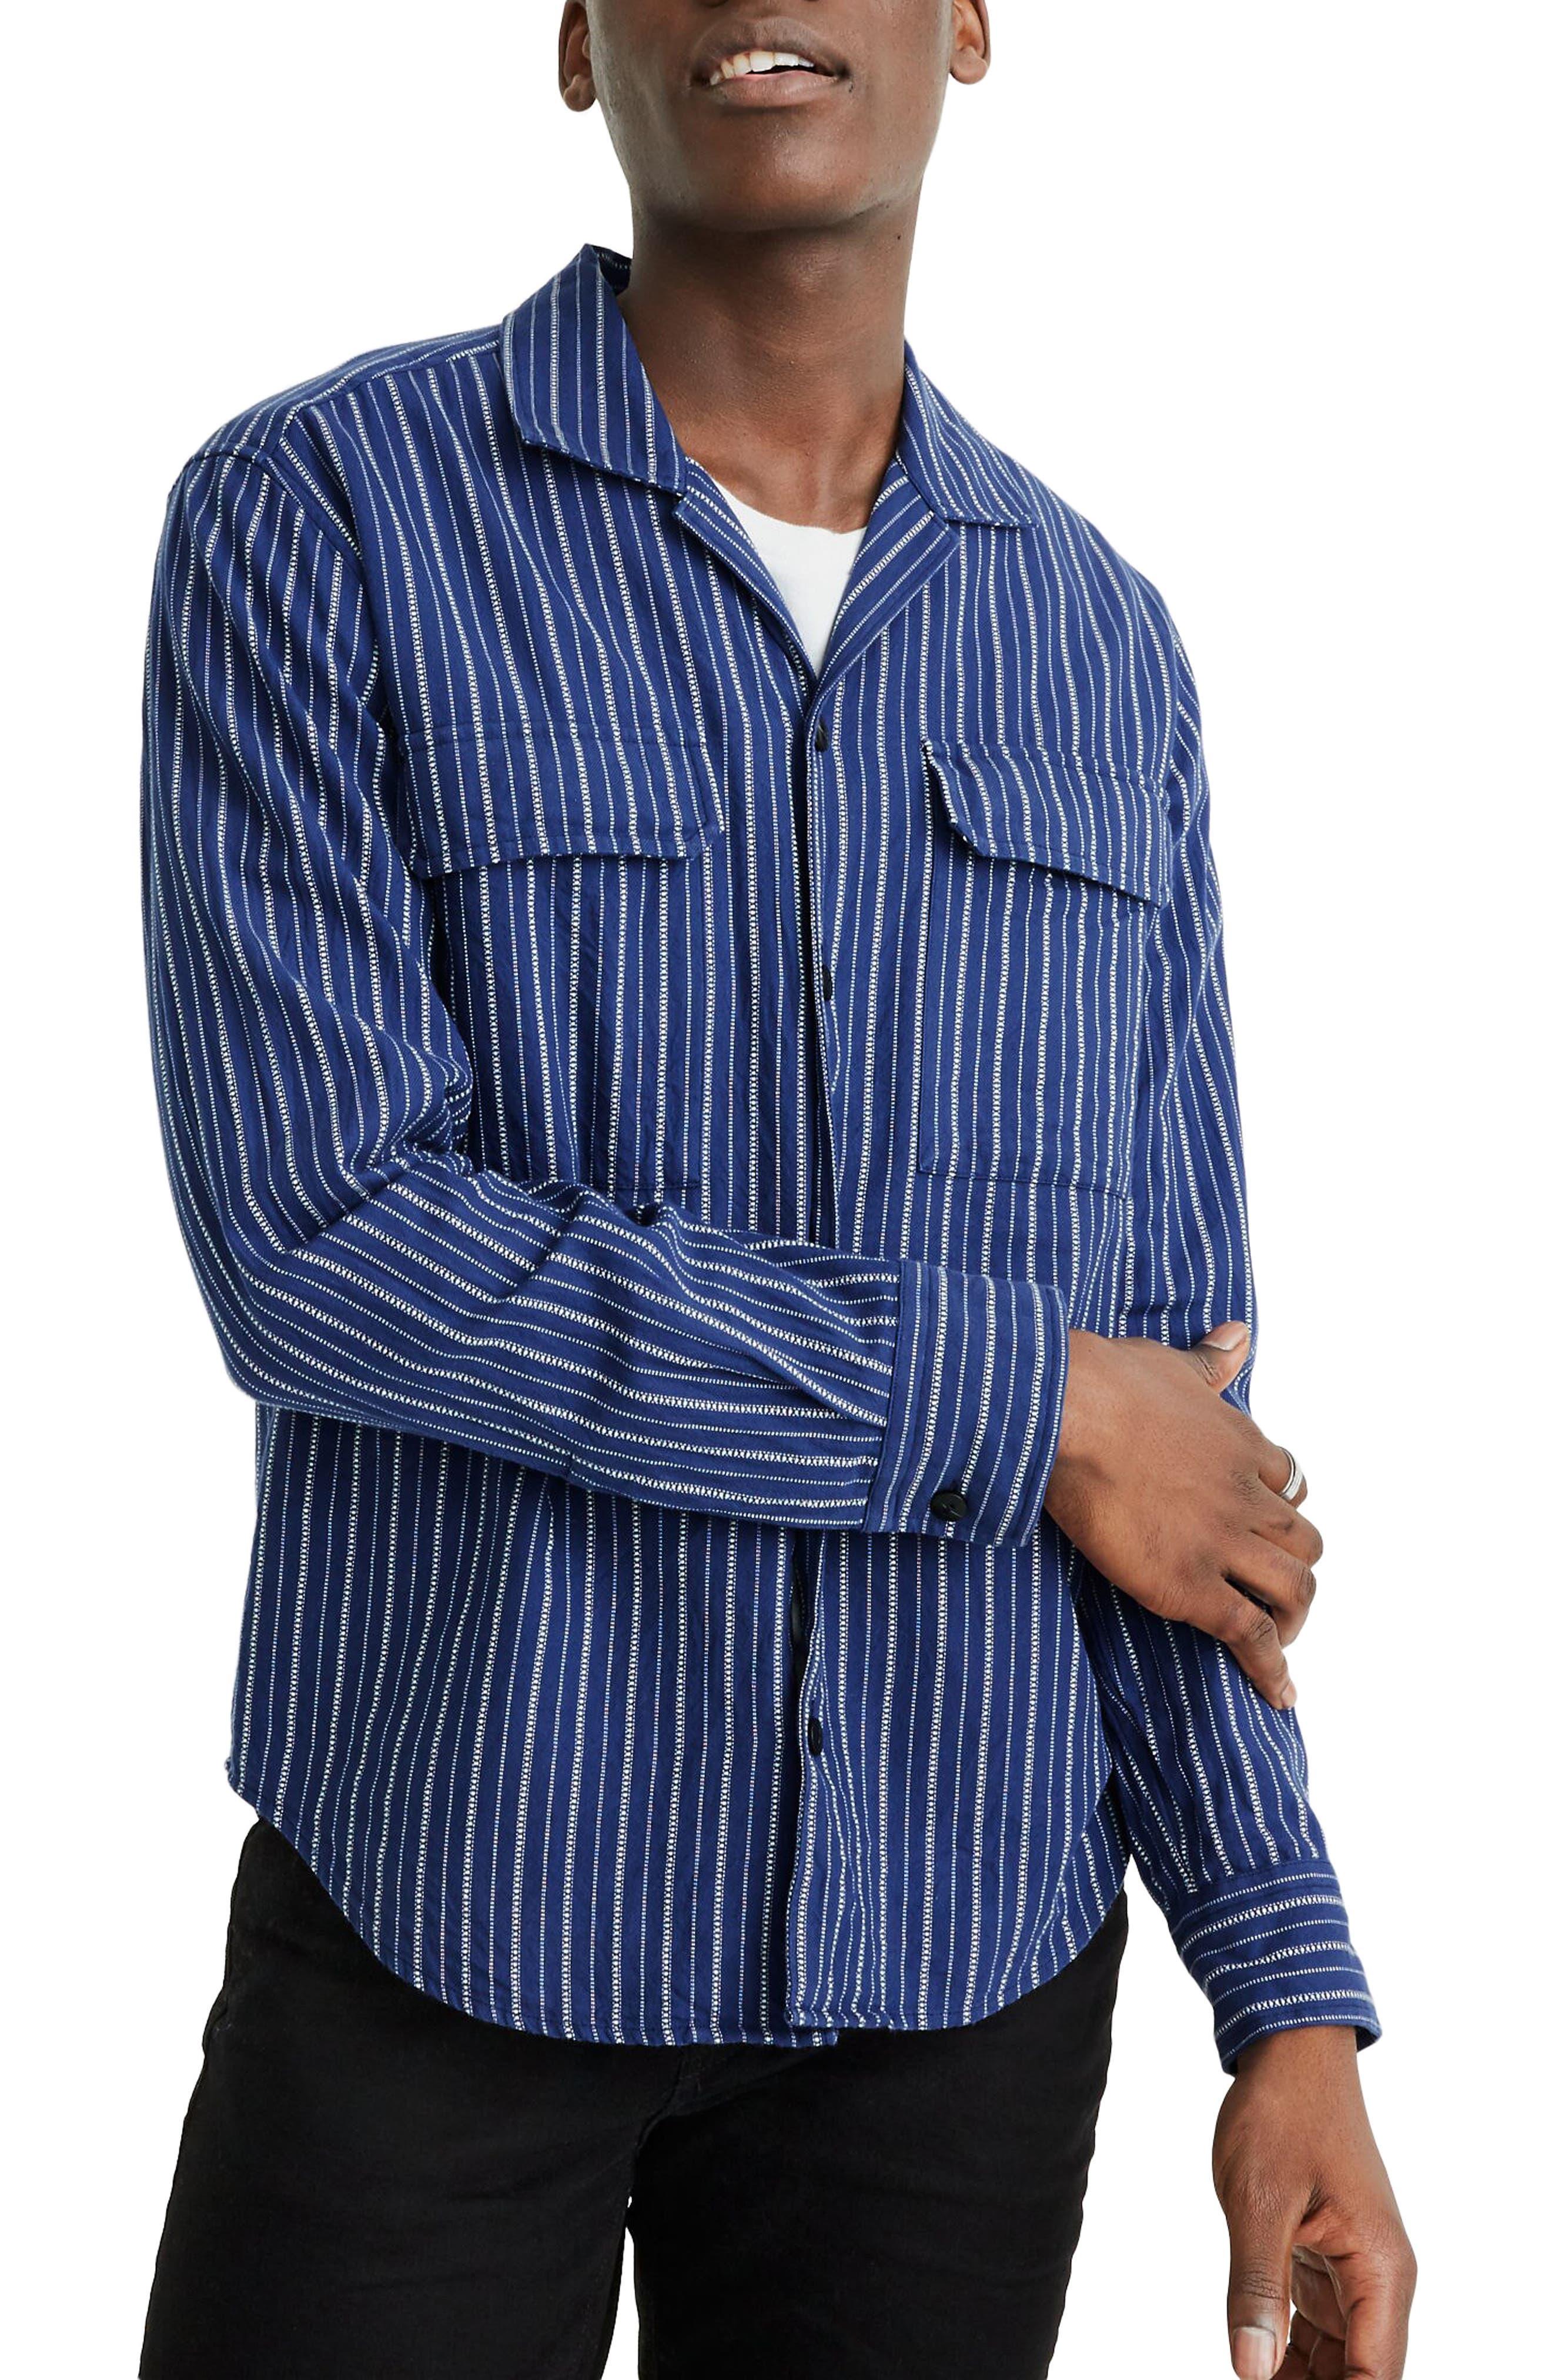 Mens Vintage Shirts – Retro Shirts Mens Madewell Easy Textured Stripe Camp Shirt $42.50 AT vintagedancer.com